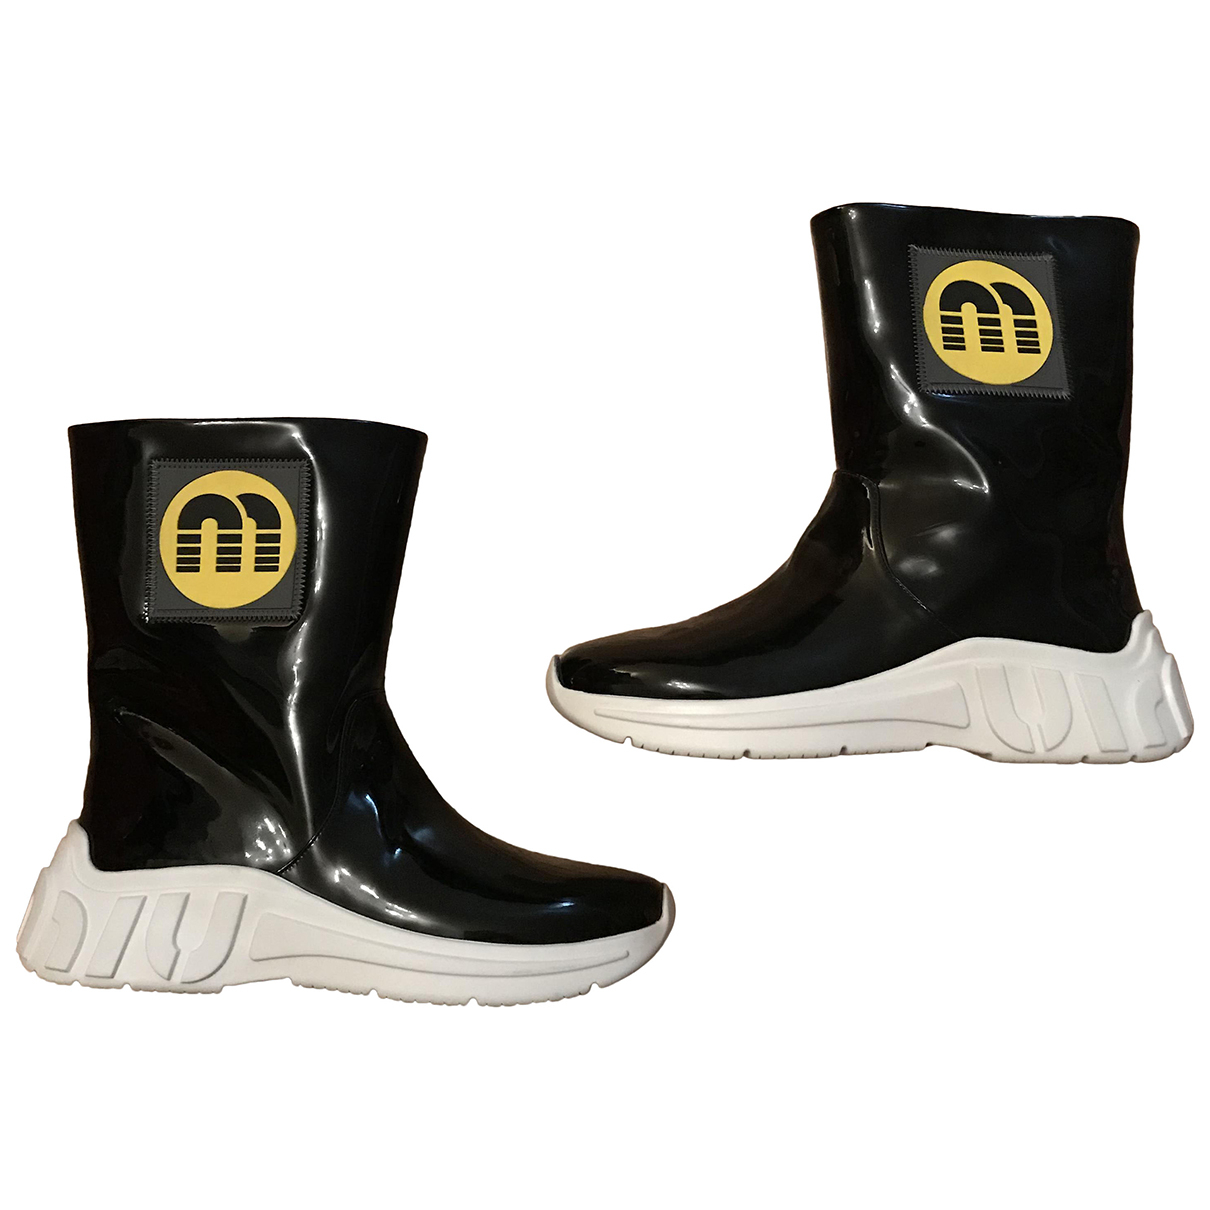 Miu Miu N Black Patent leather Boots for Women 36 EU